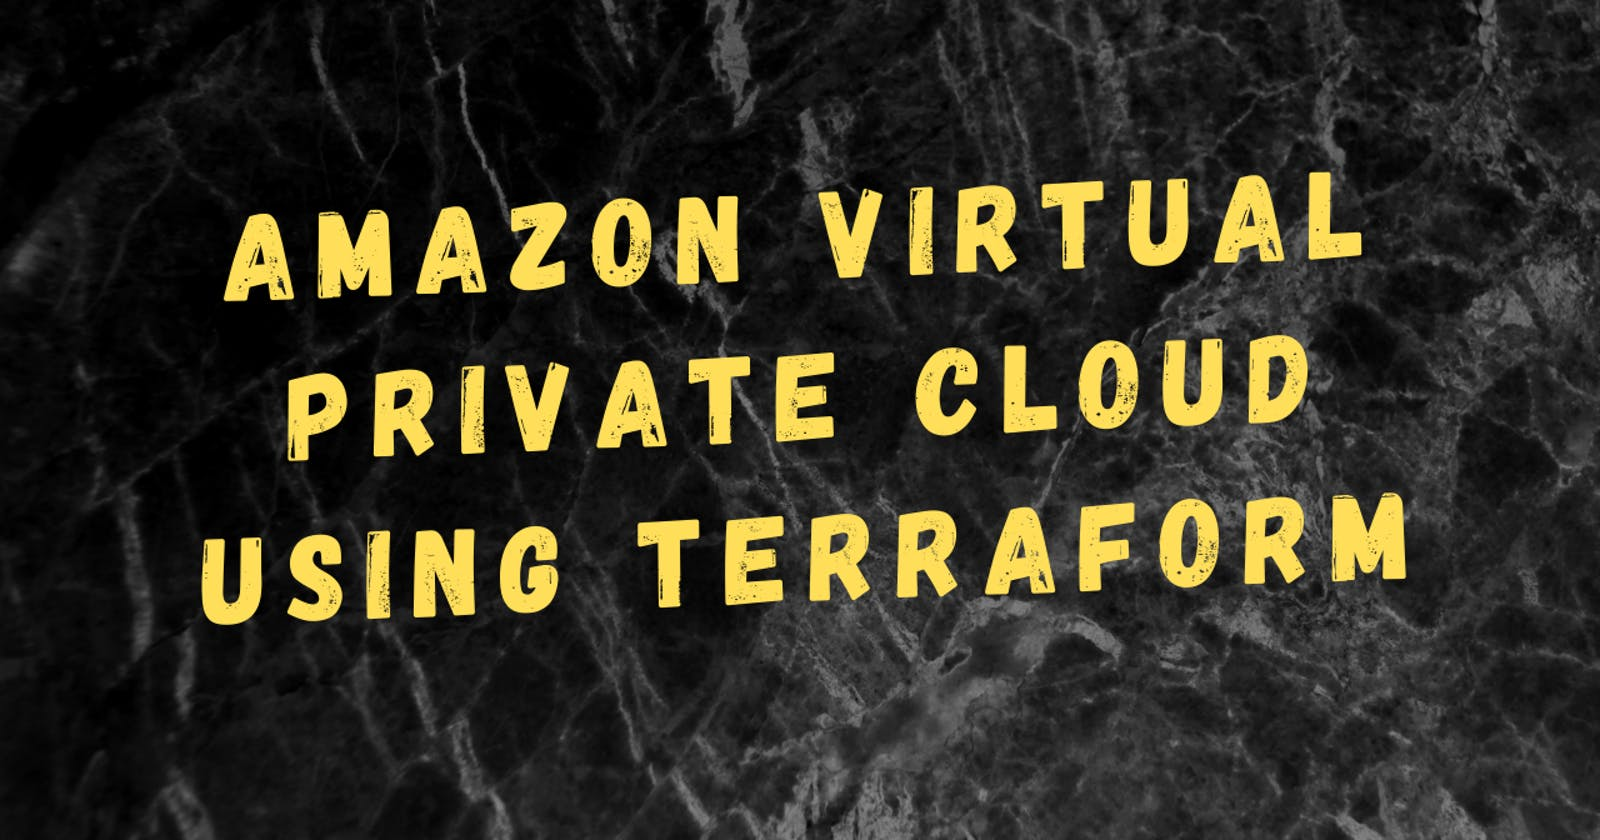 Amazon Virtual Private Cloud using Terraform